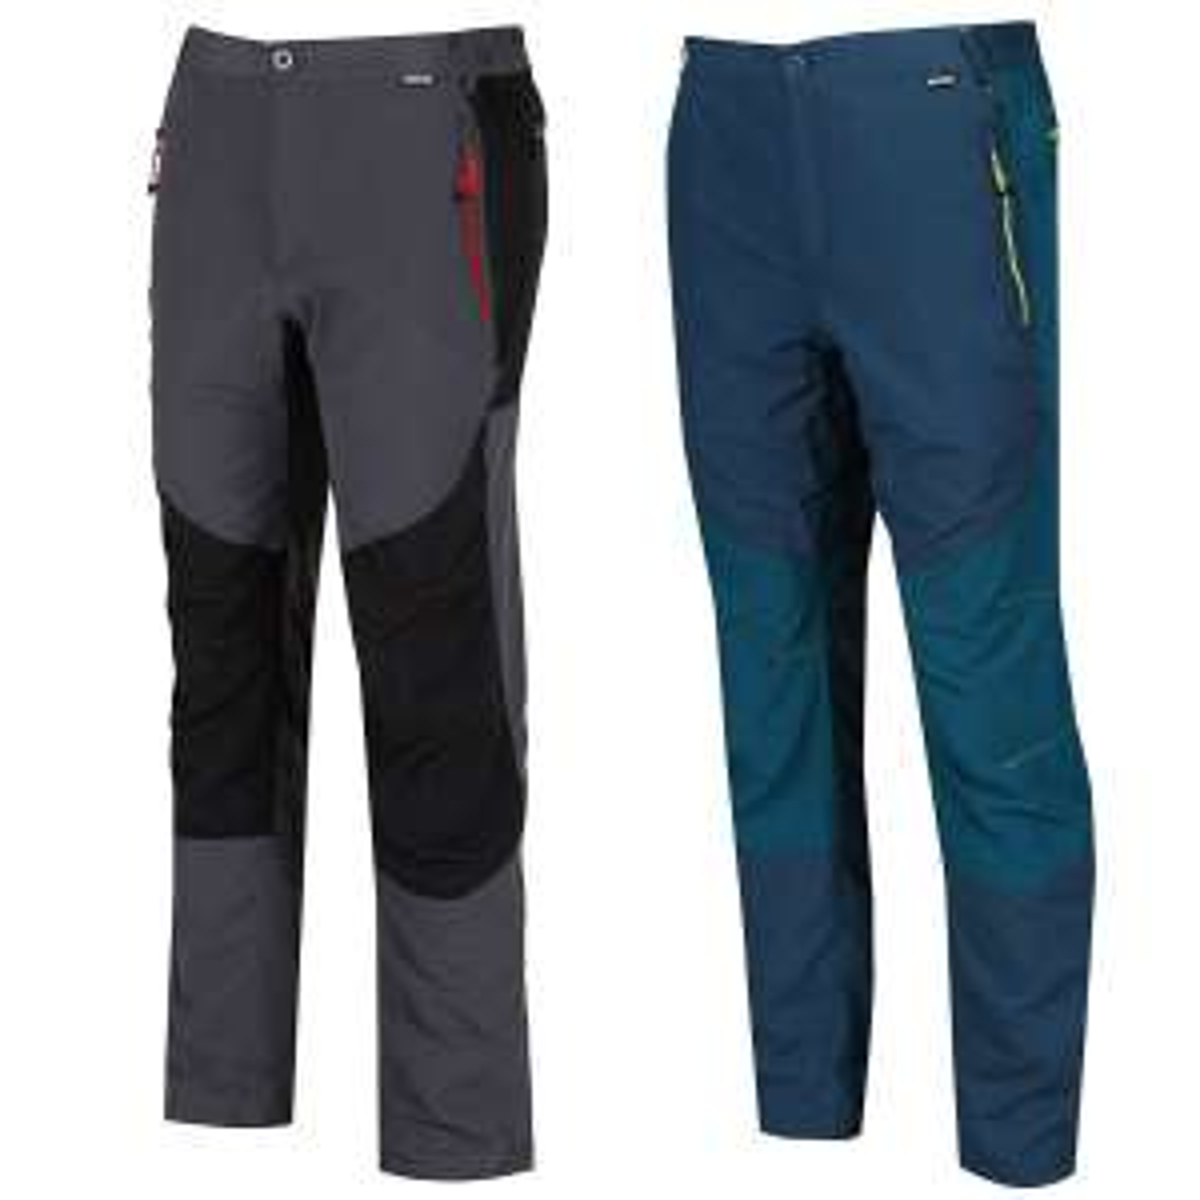 Regatta Sungari hiking Trousers (all sizes majolica/seablue) £14.99 @ eBay/golfbase